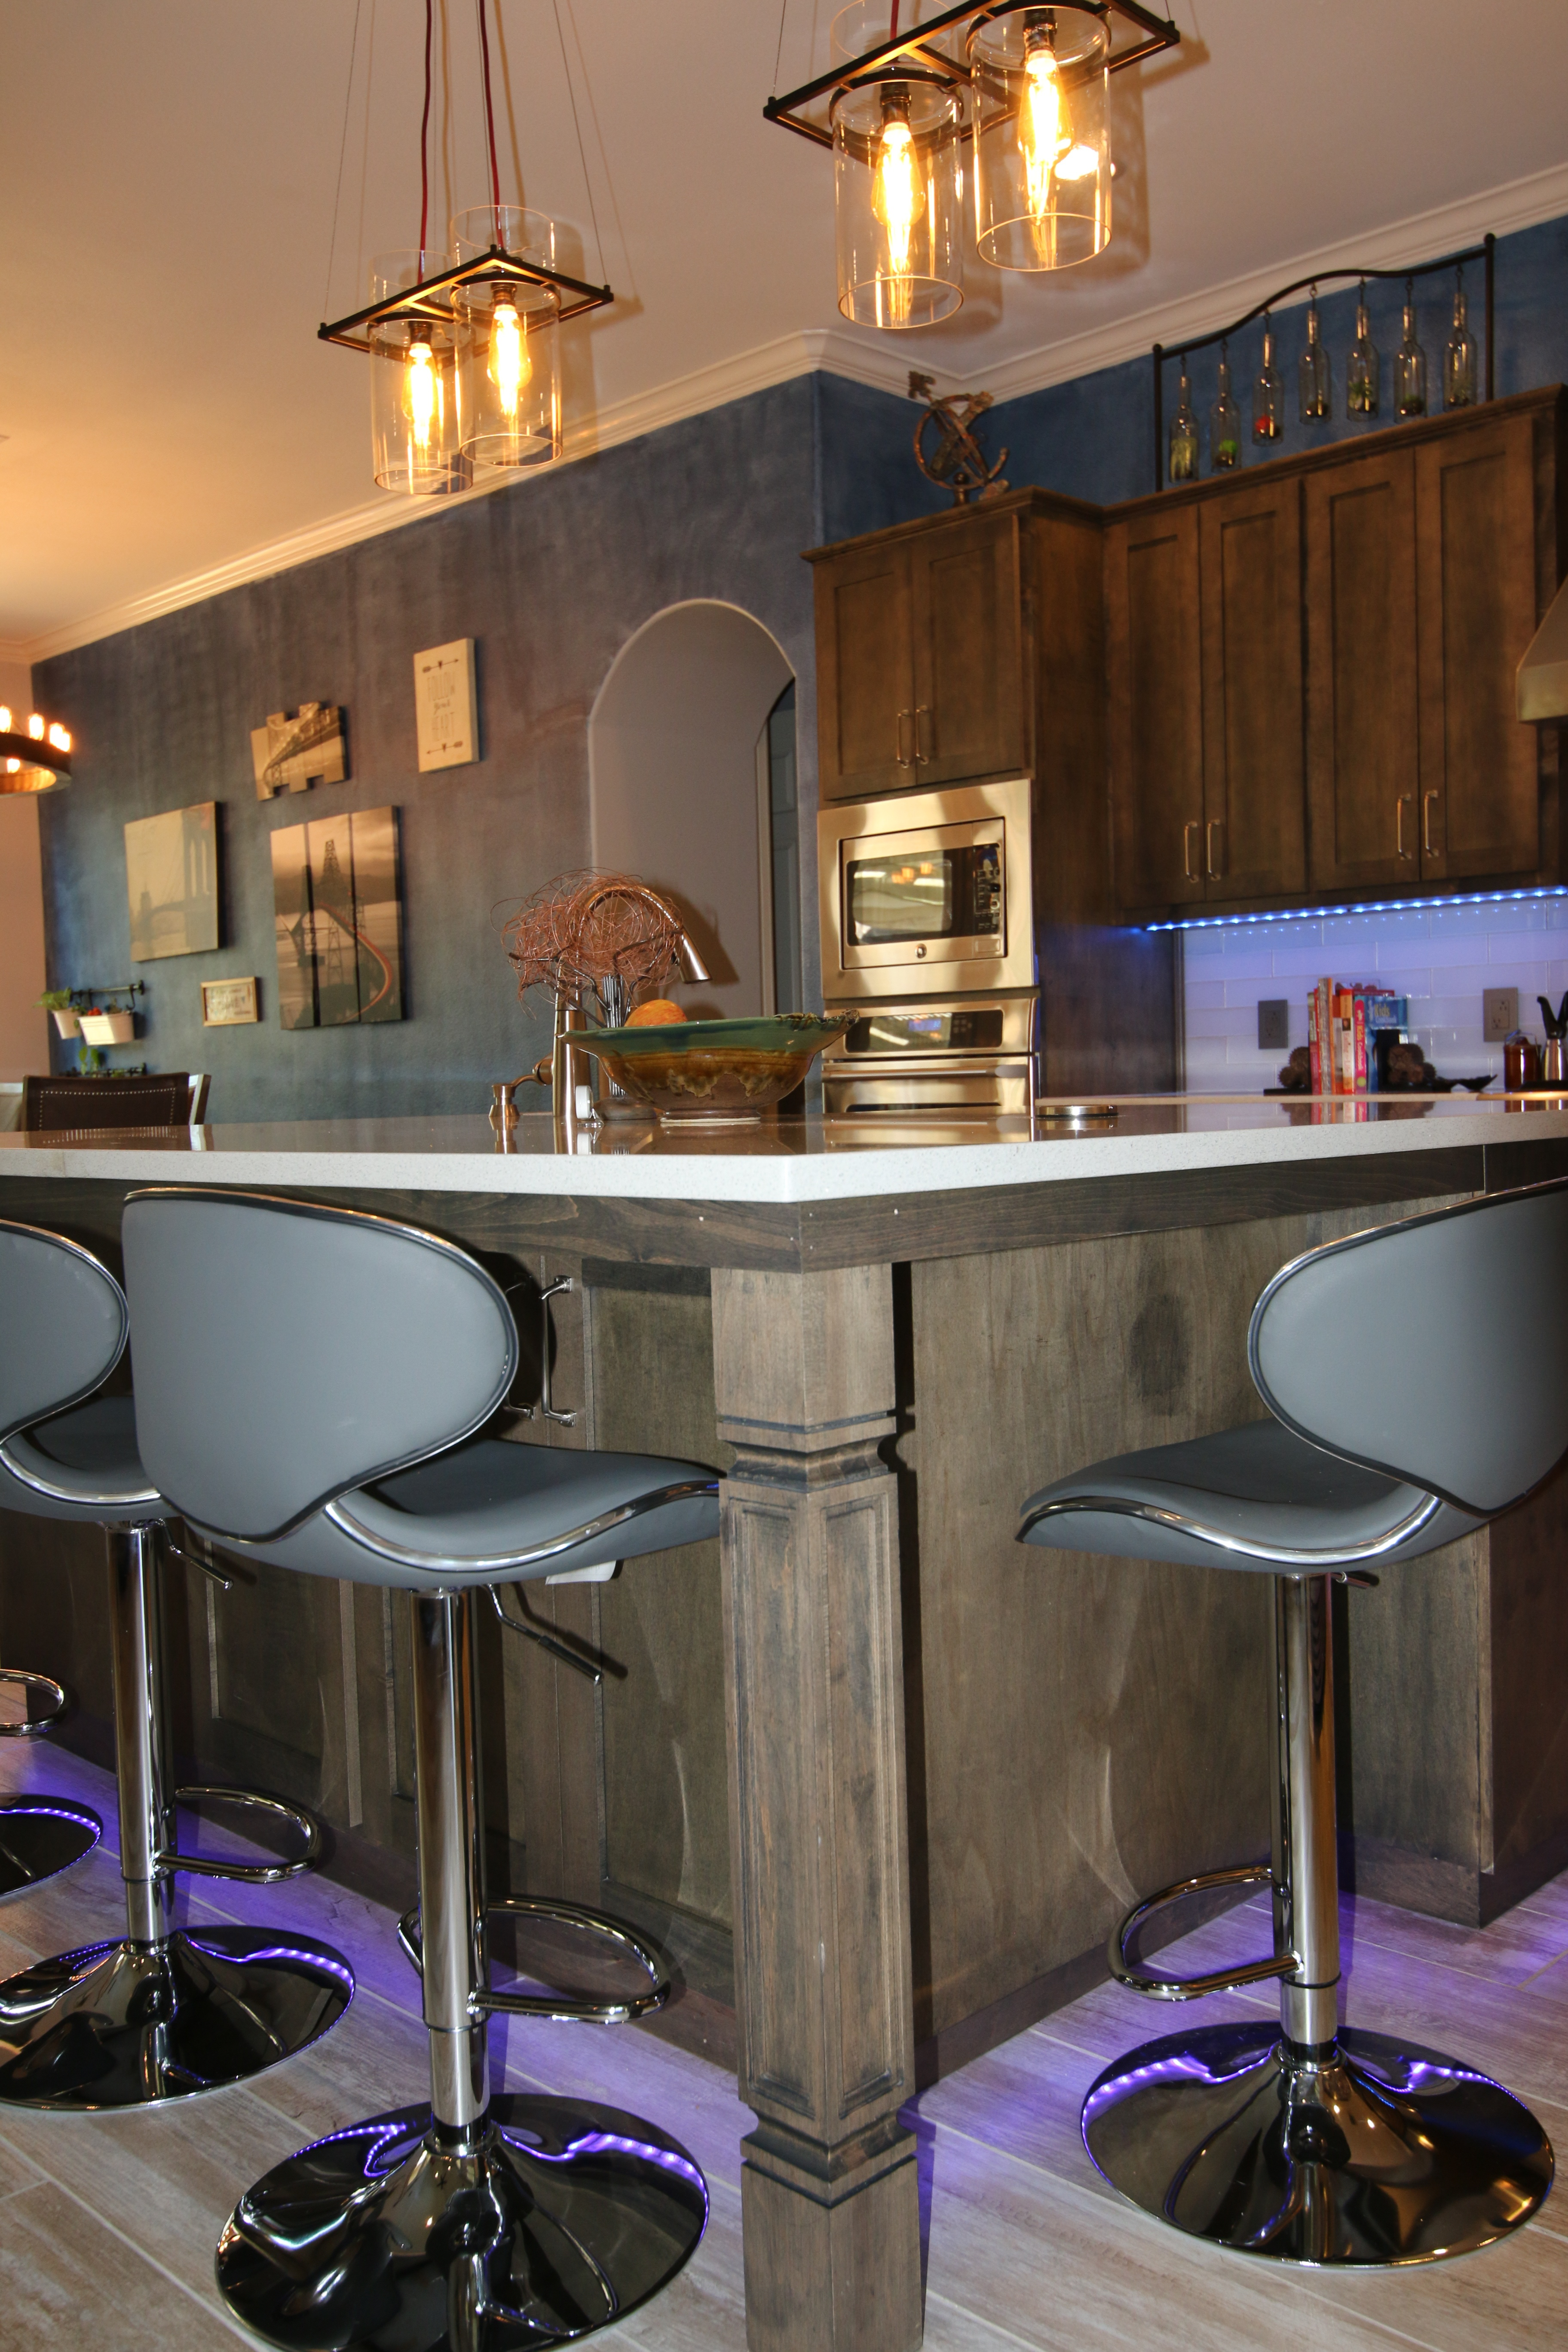 Kitchen remodel Austin, Texas